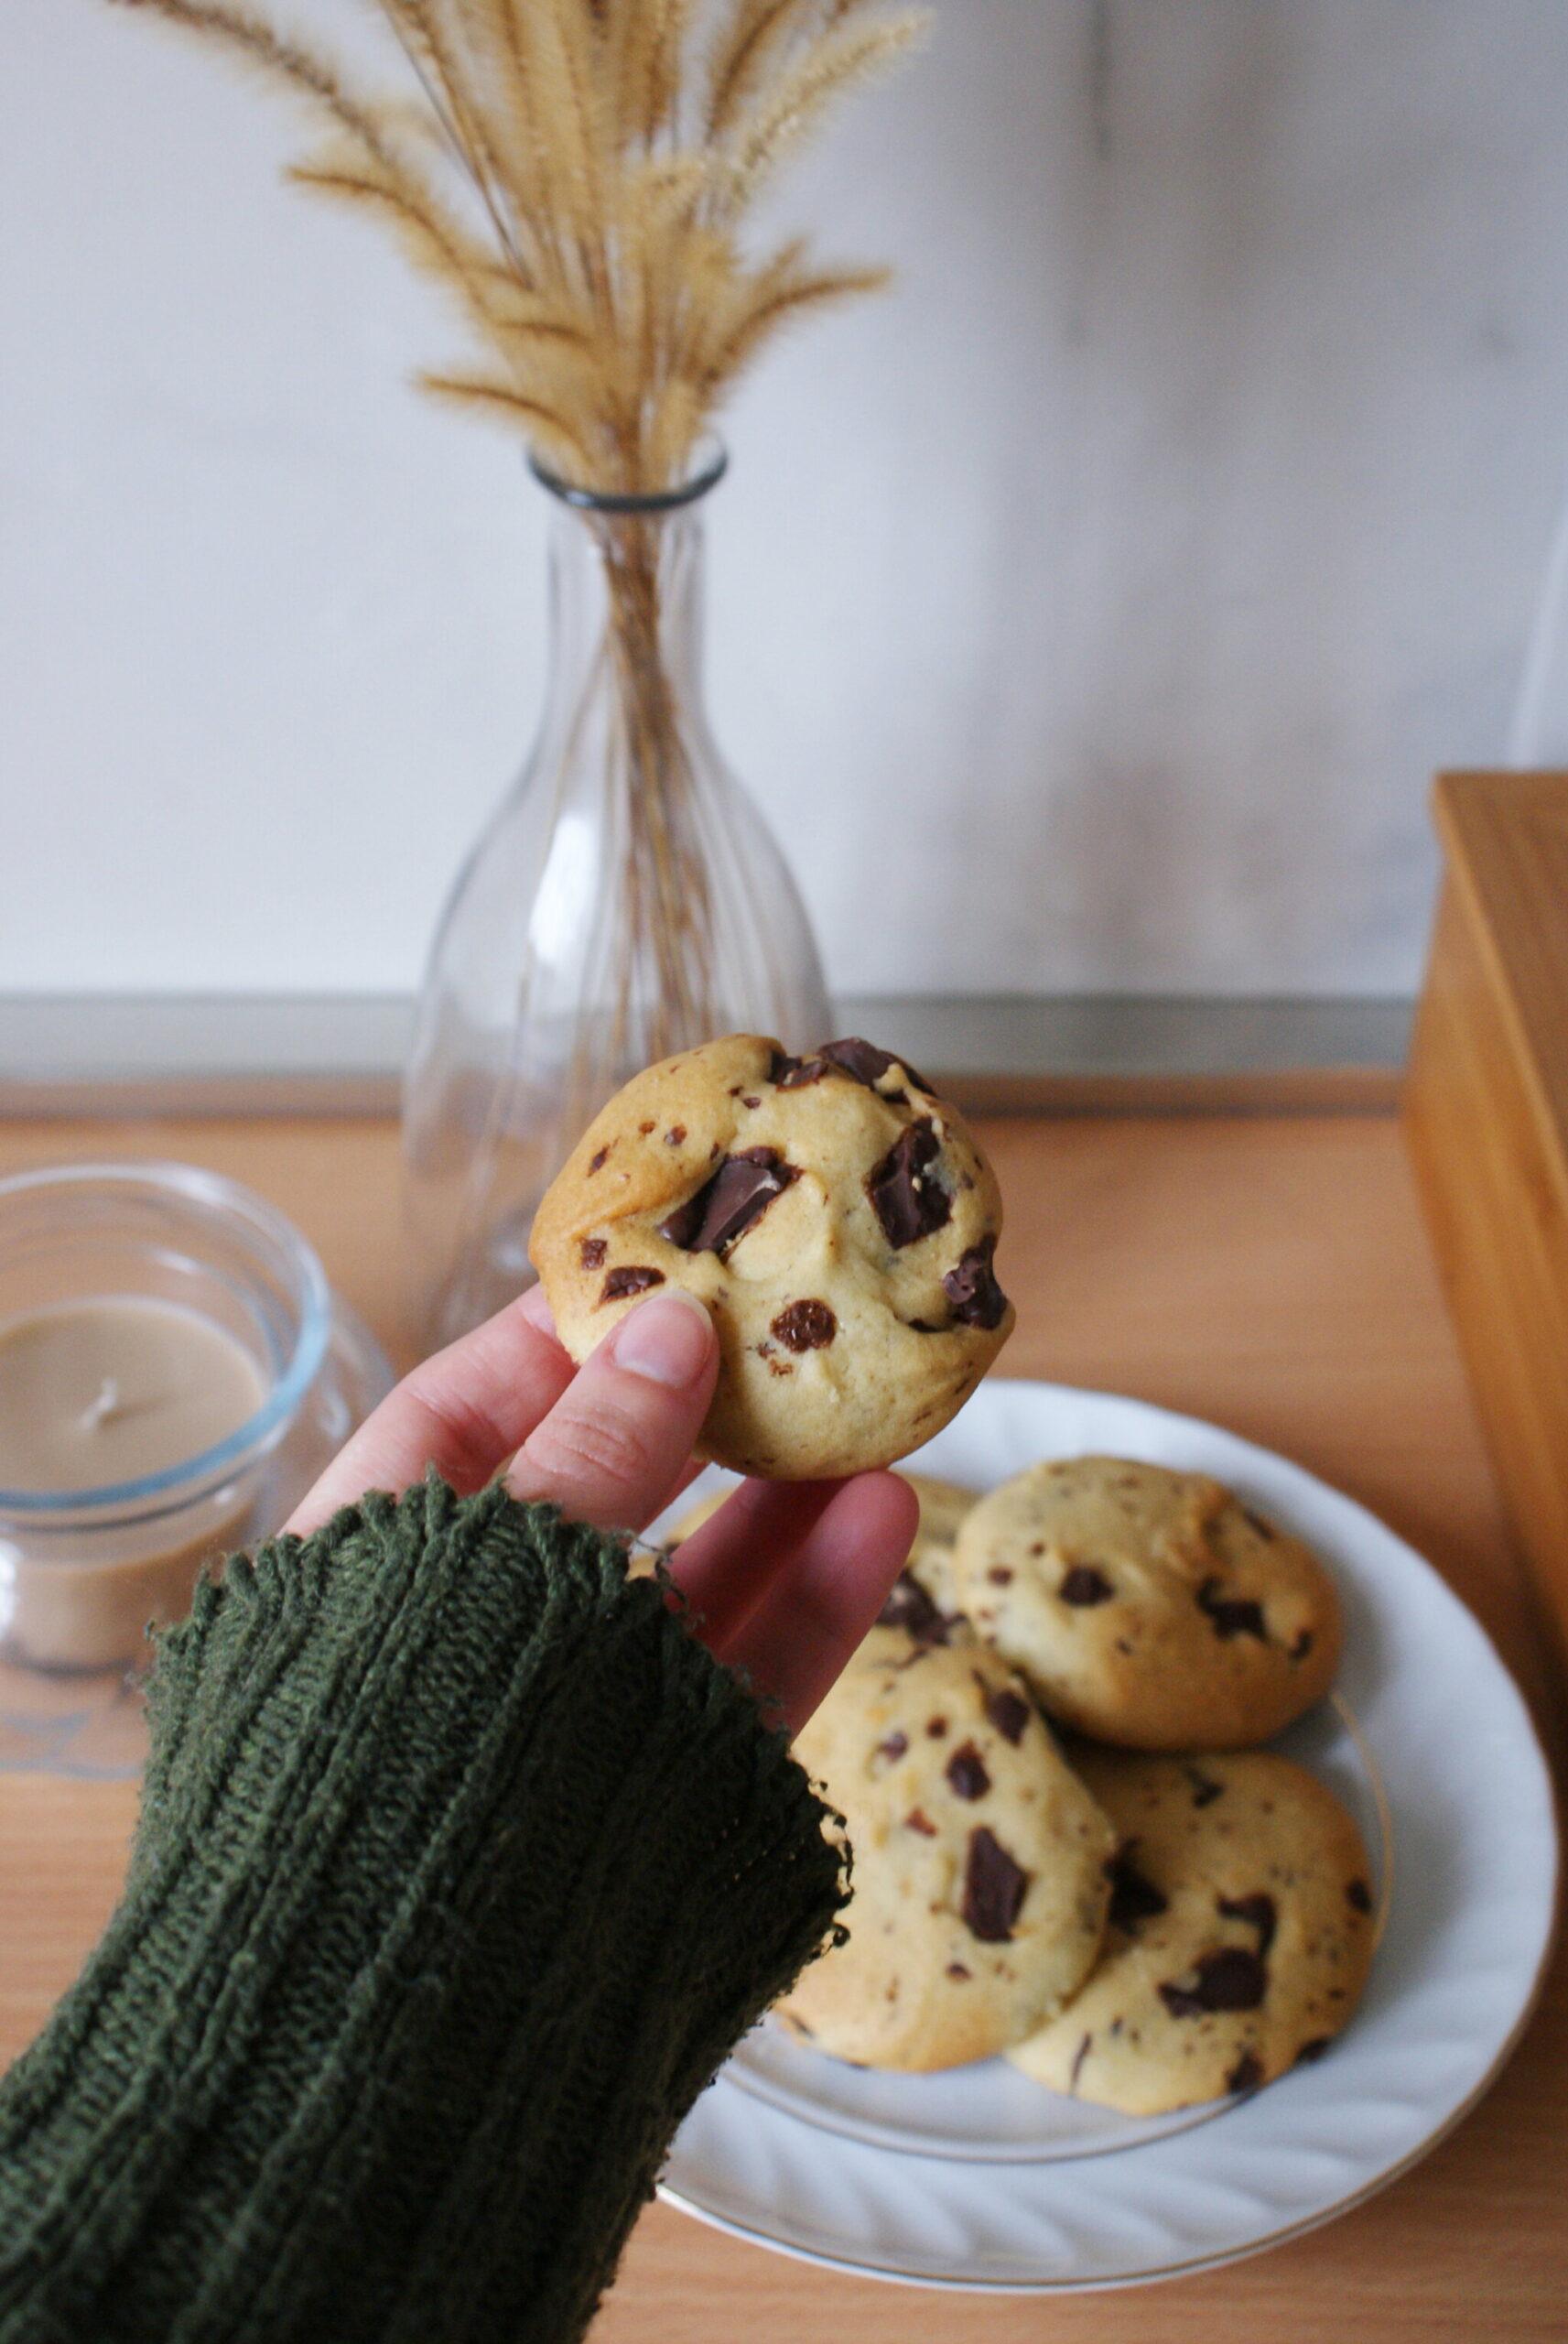 best easy vegan chocolate chips cookies recipe healthy bake quick 20 minute plant based ultimate francinesplaceblog traditional